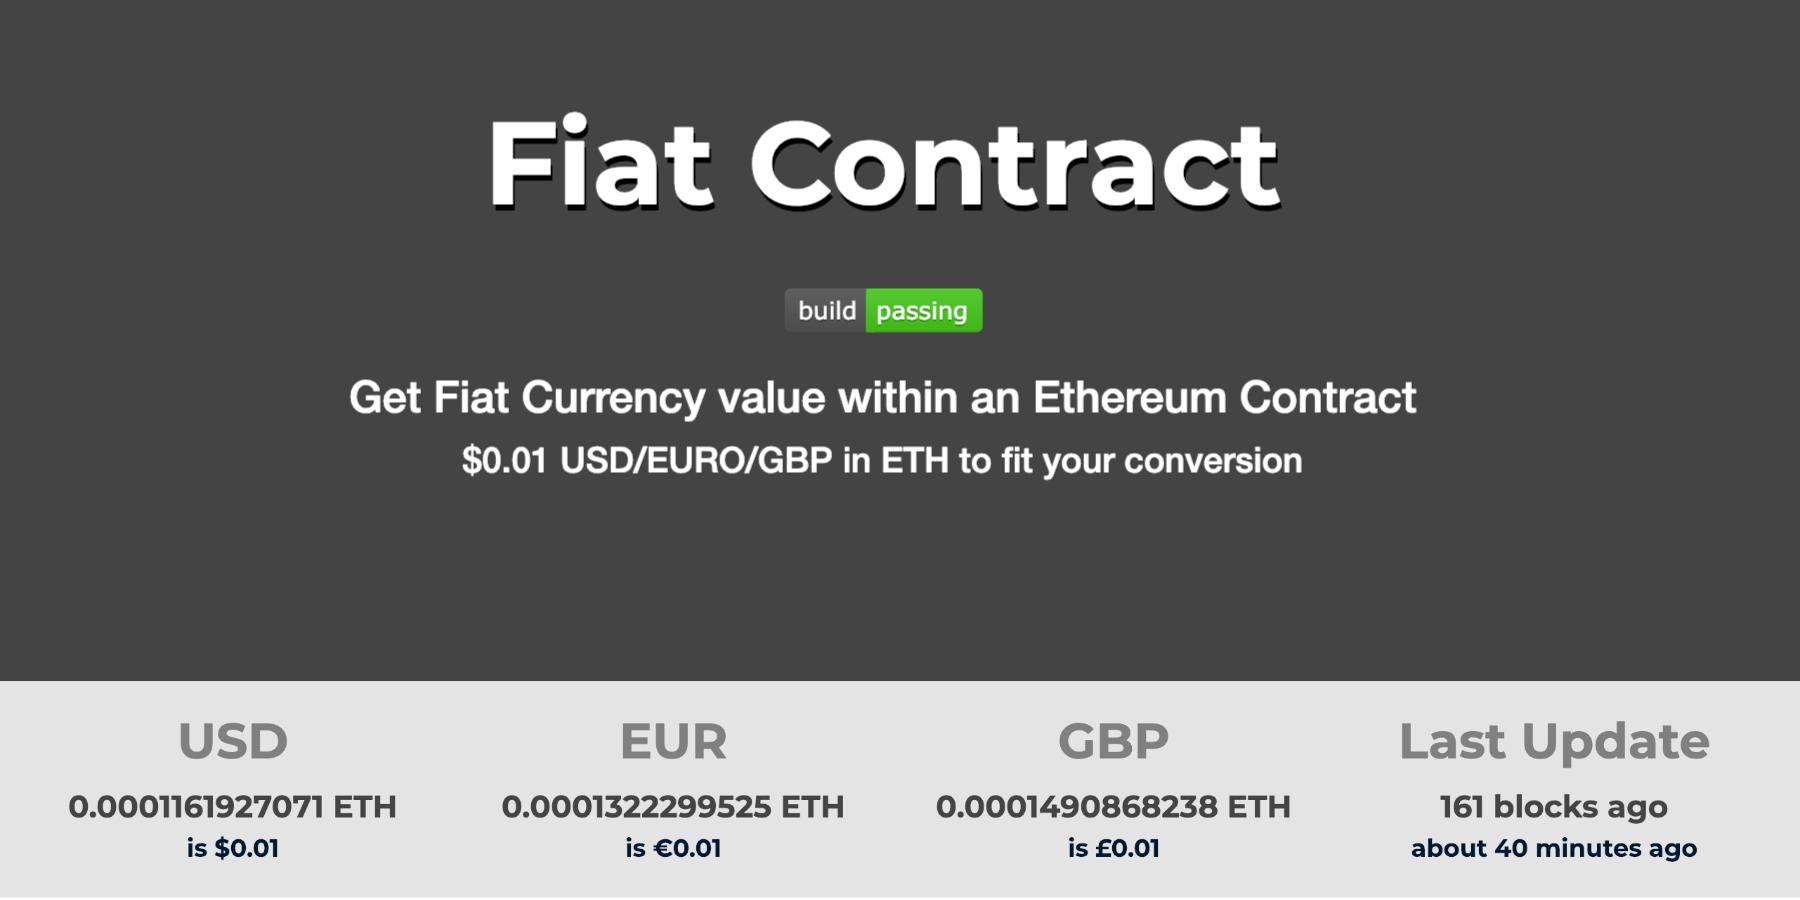 fiatcontract